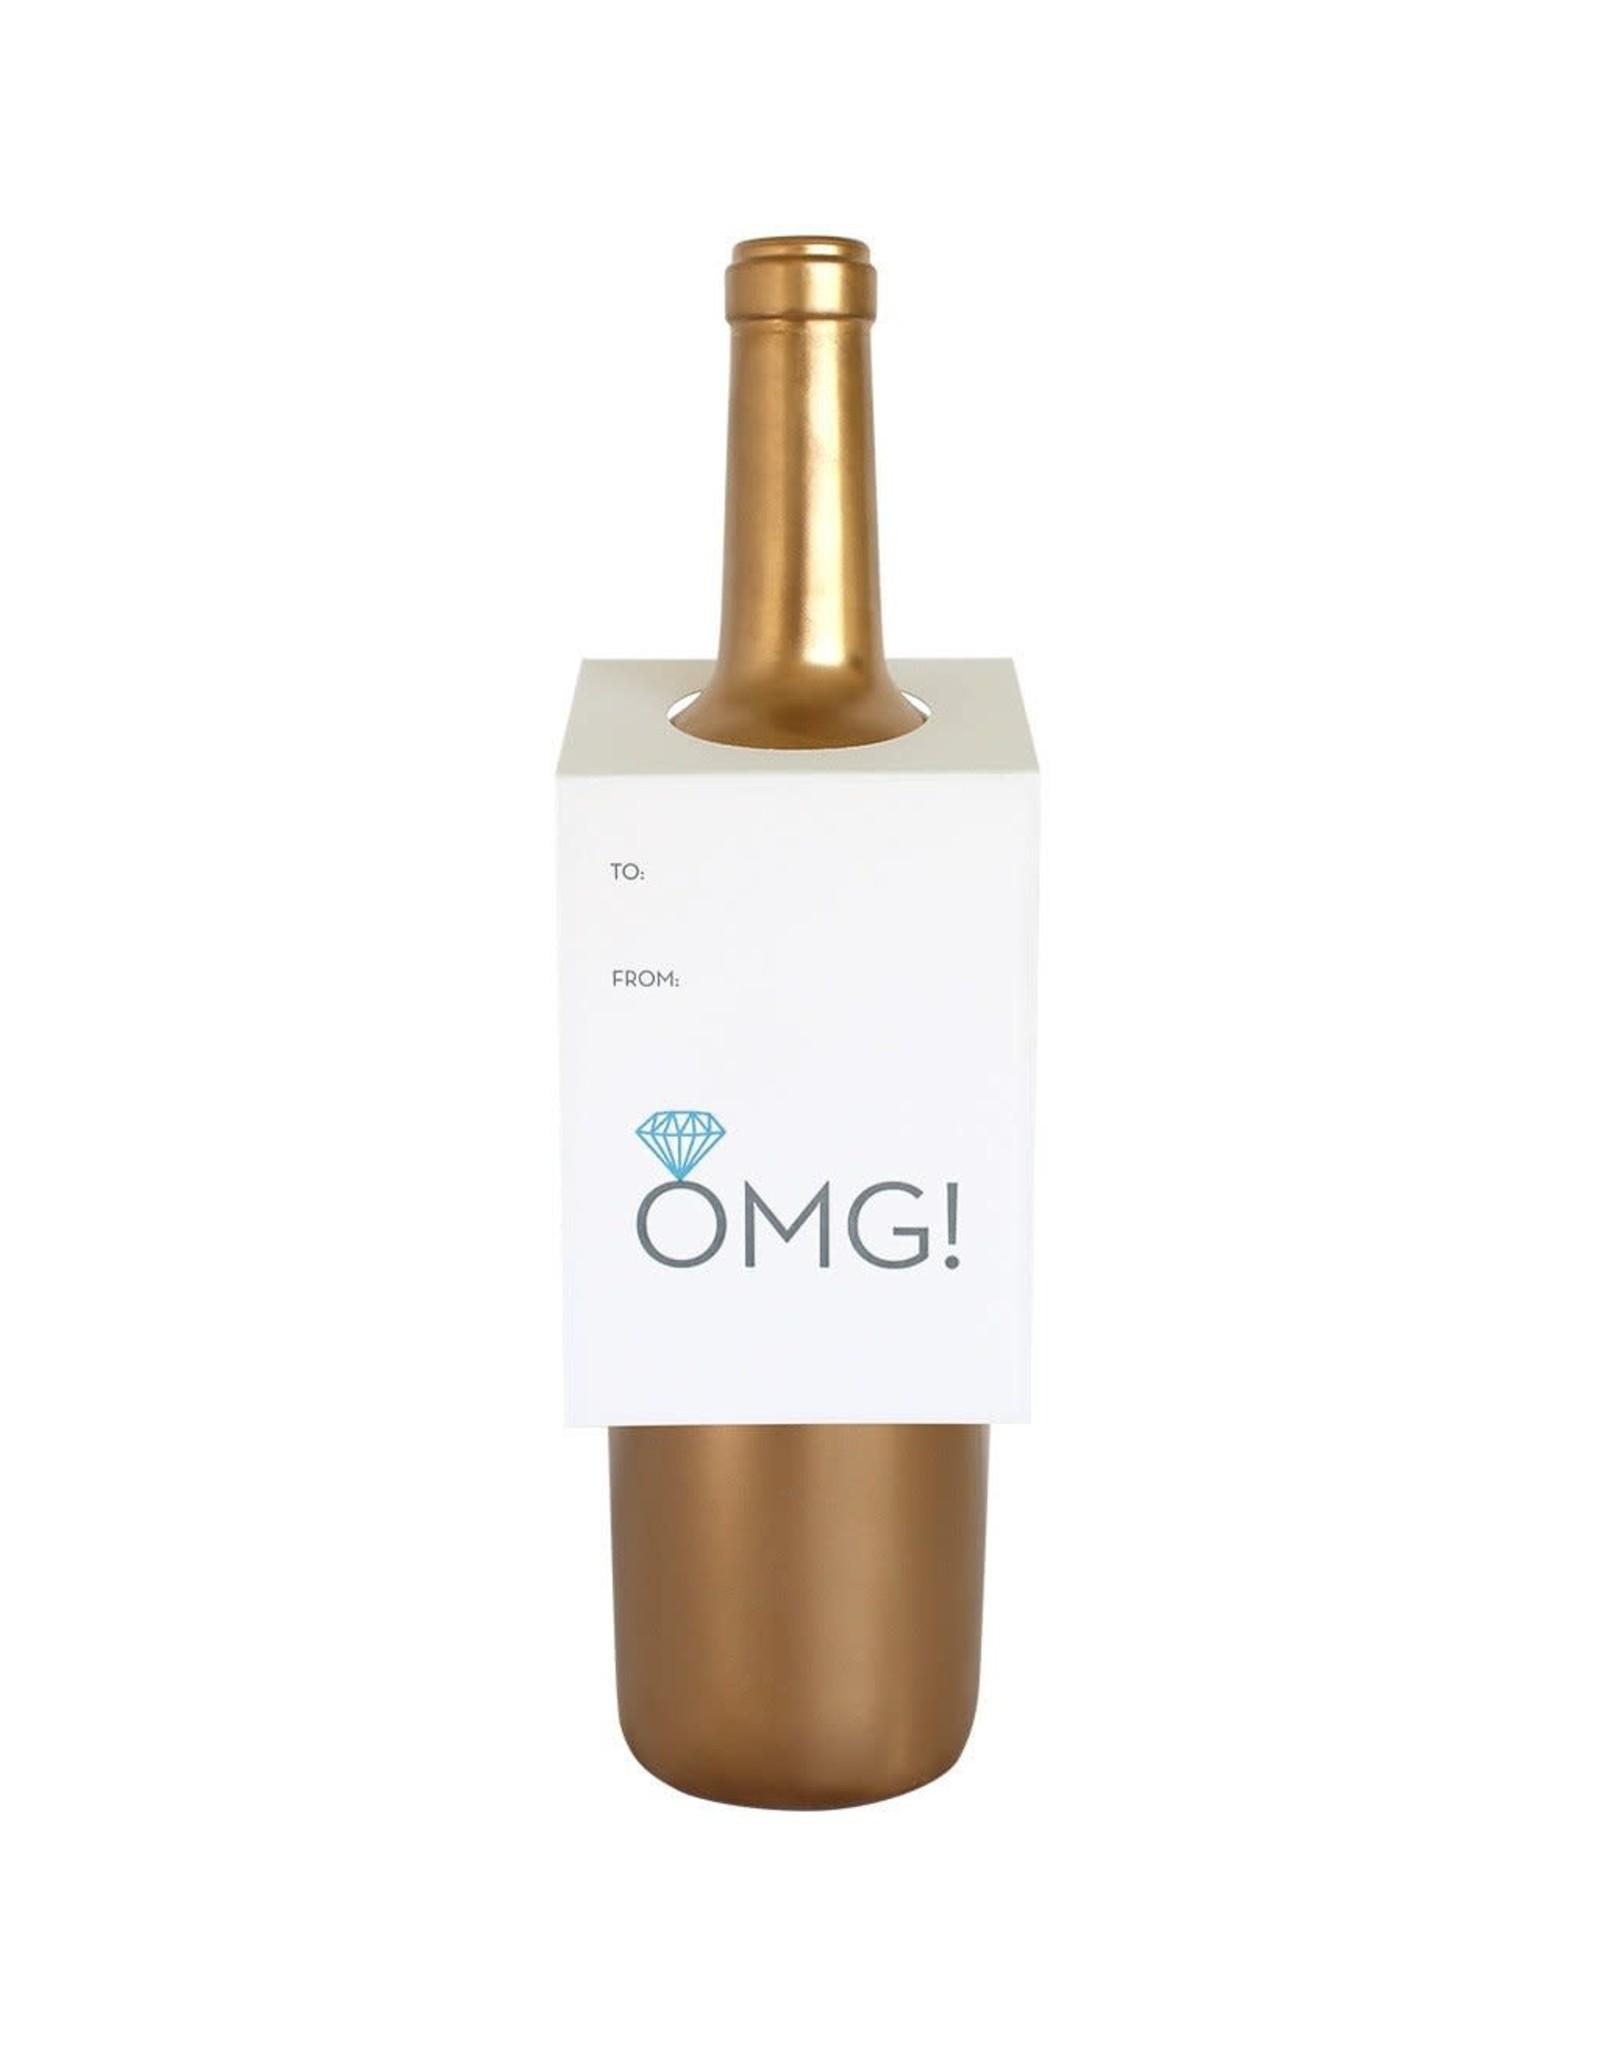 Chez Gagne OMG Engagement Ring - Wine & Spirit Tag